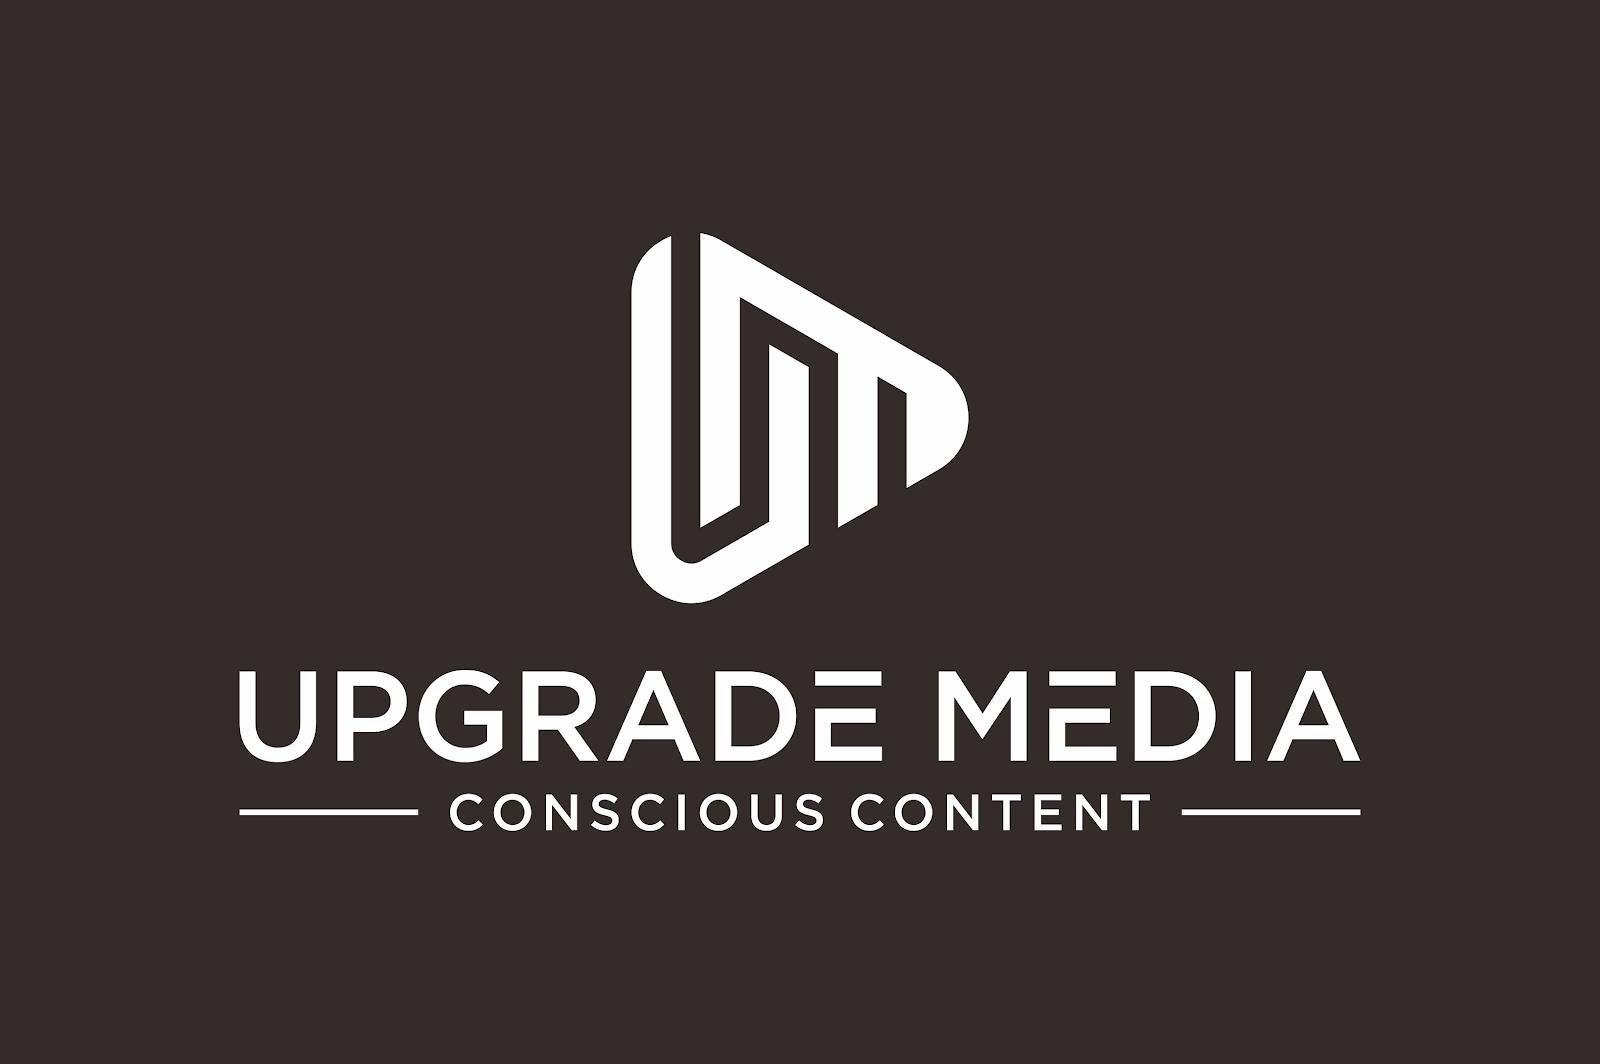 Upgrade Media Conscious Content john madsen